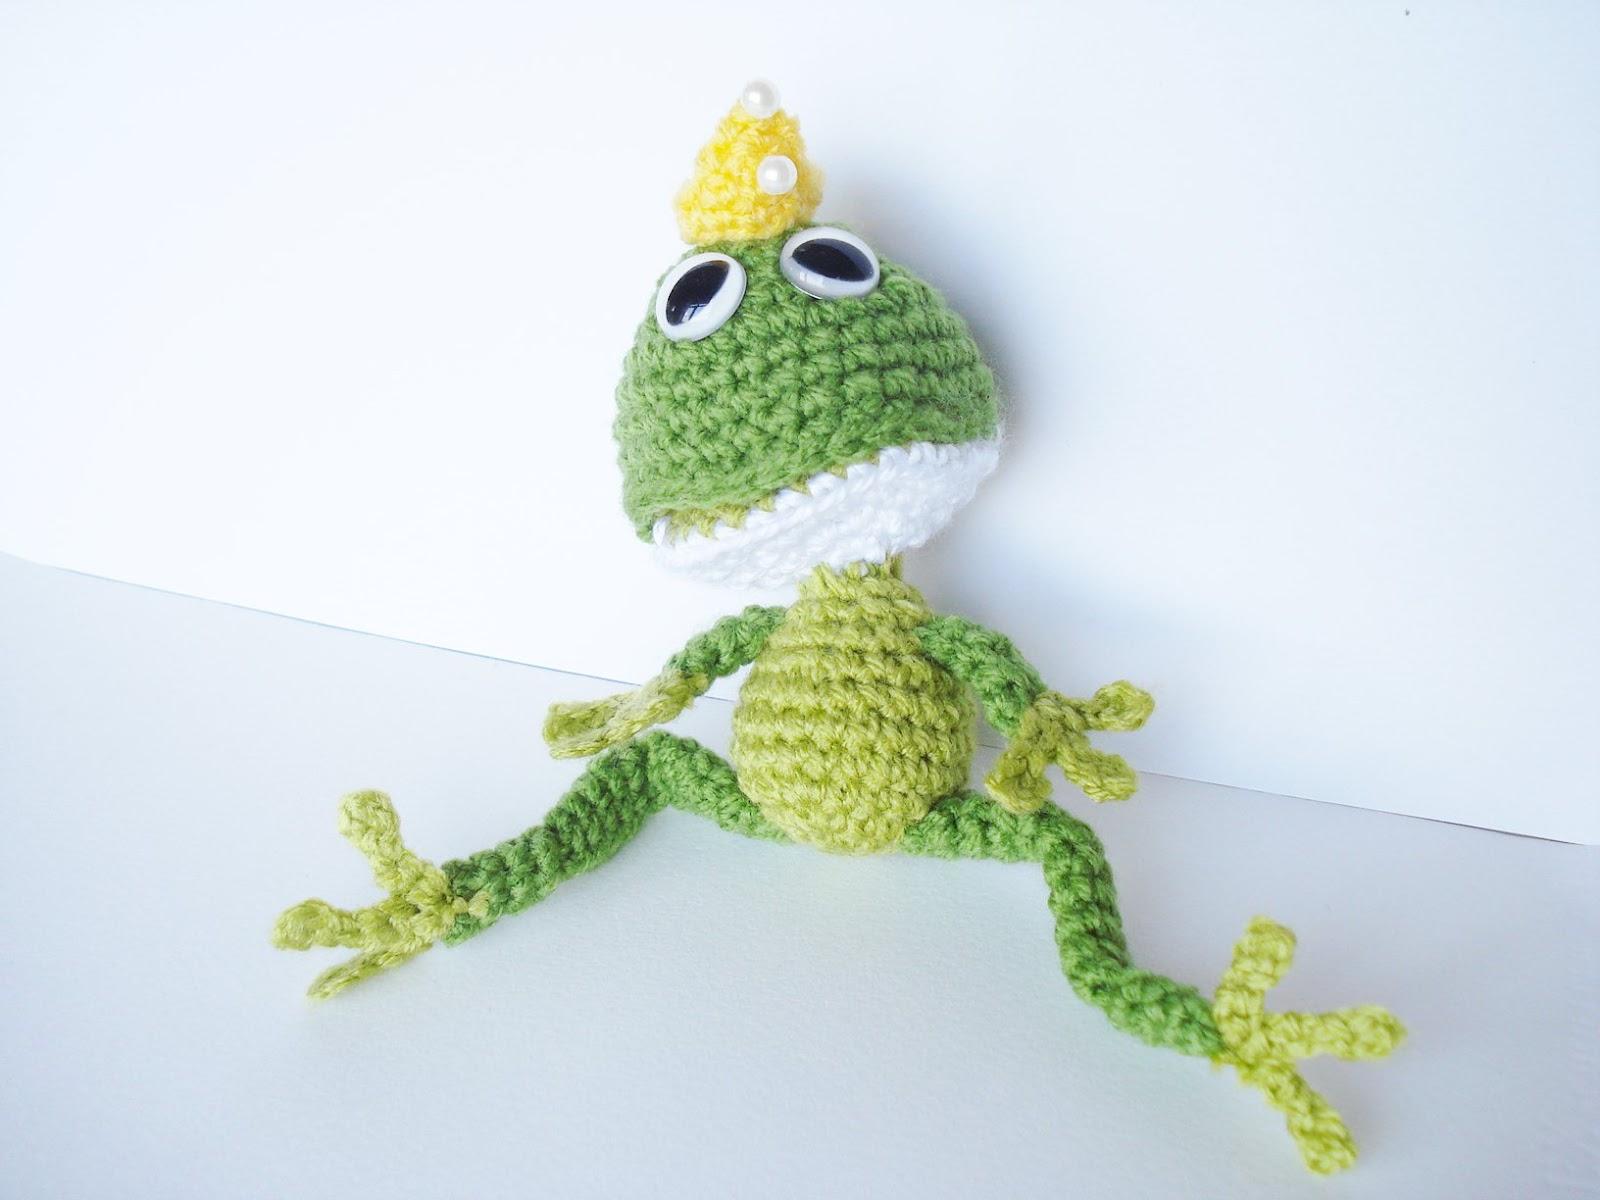 Amigurumi kermit pattern kalulu for allsocute amigurumis amigurumi frog pattern crochet frog bankloansurffo Gallery